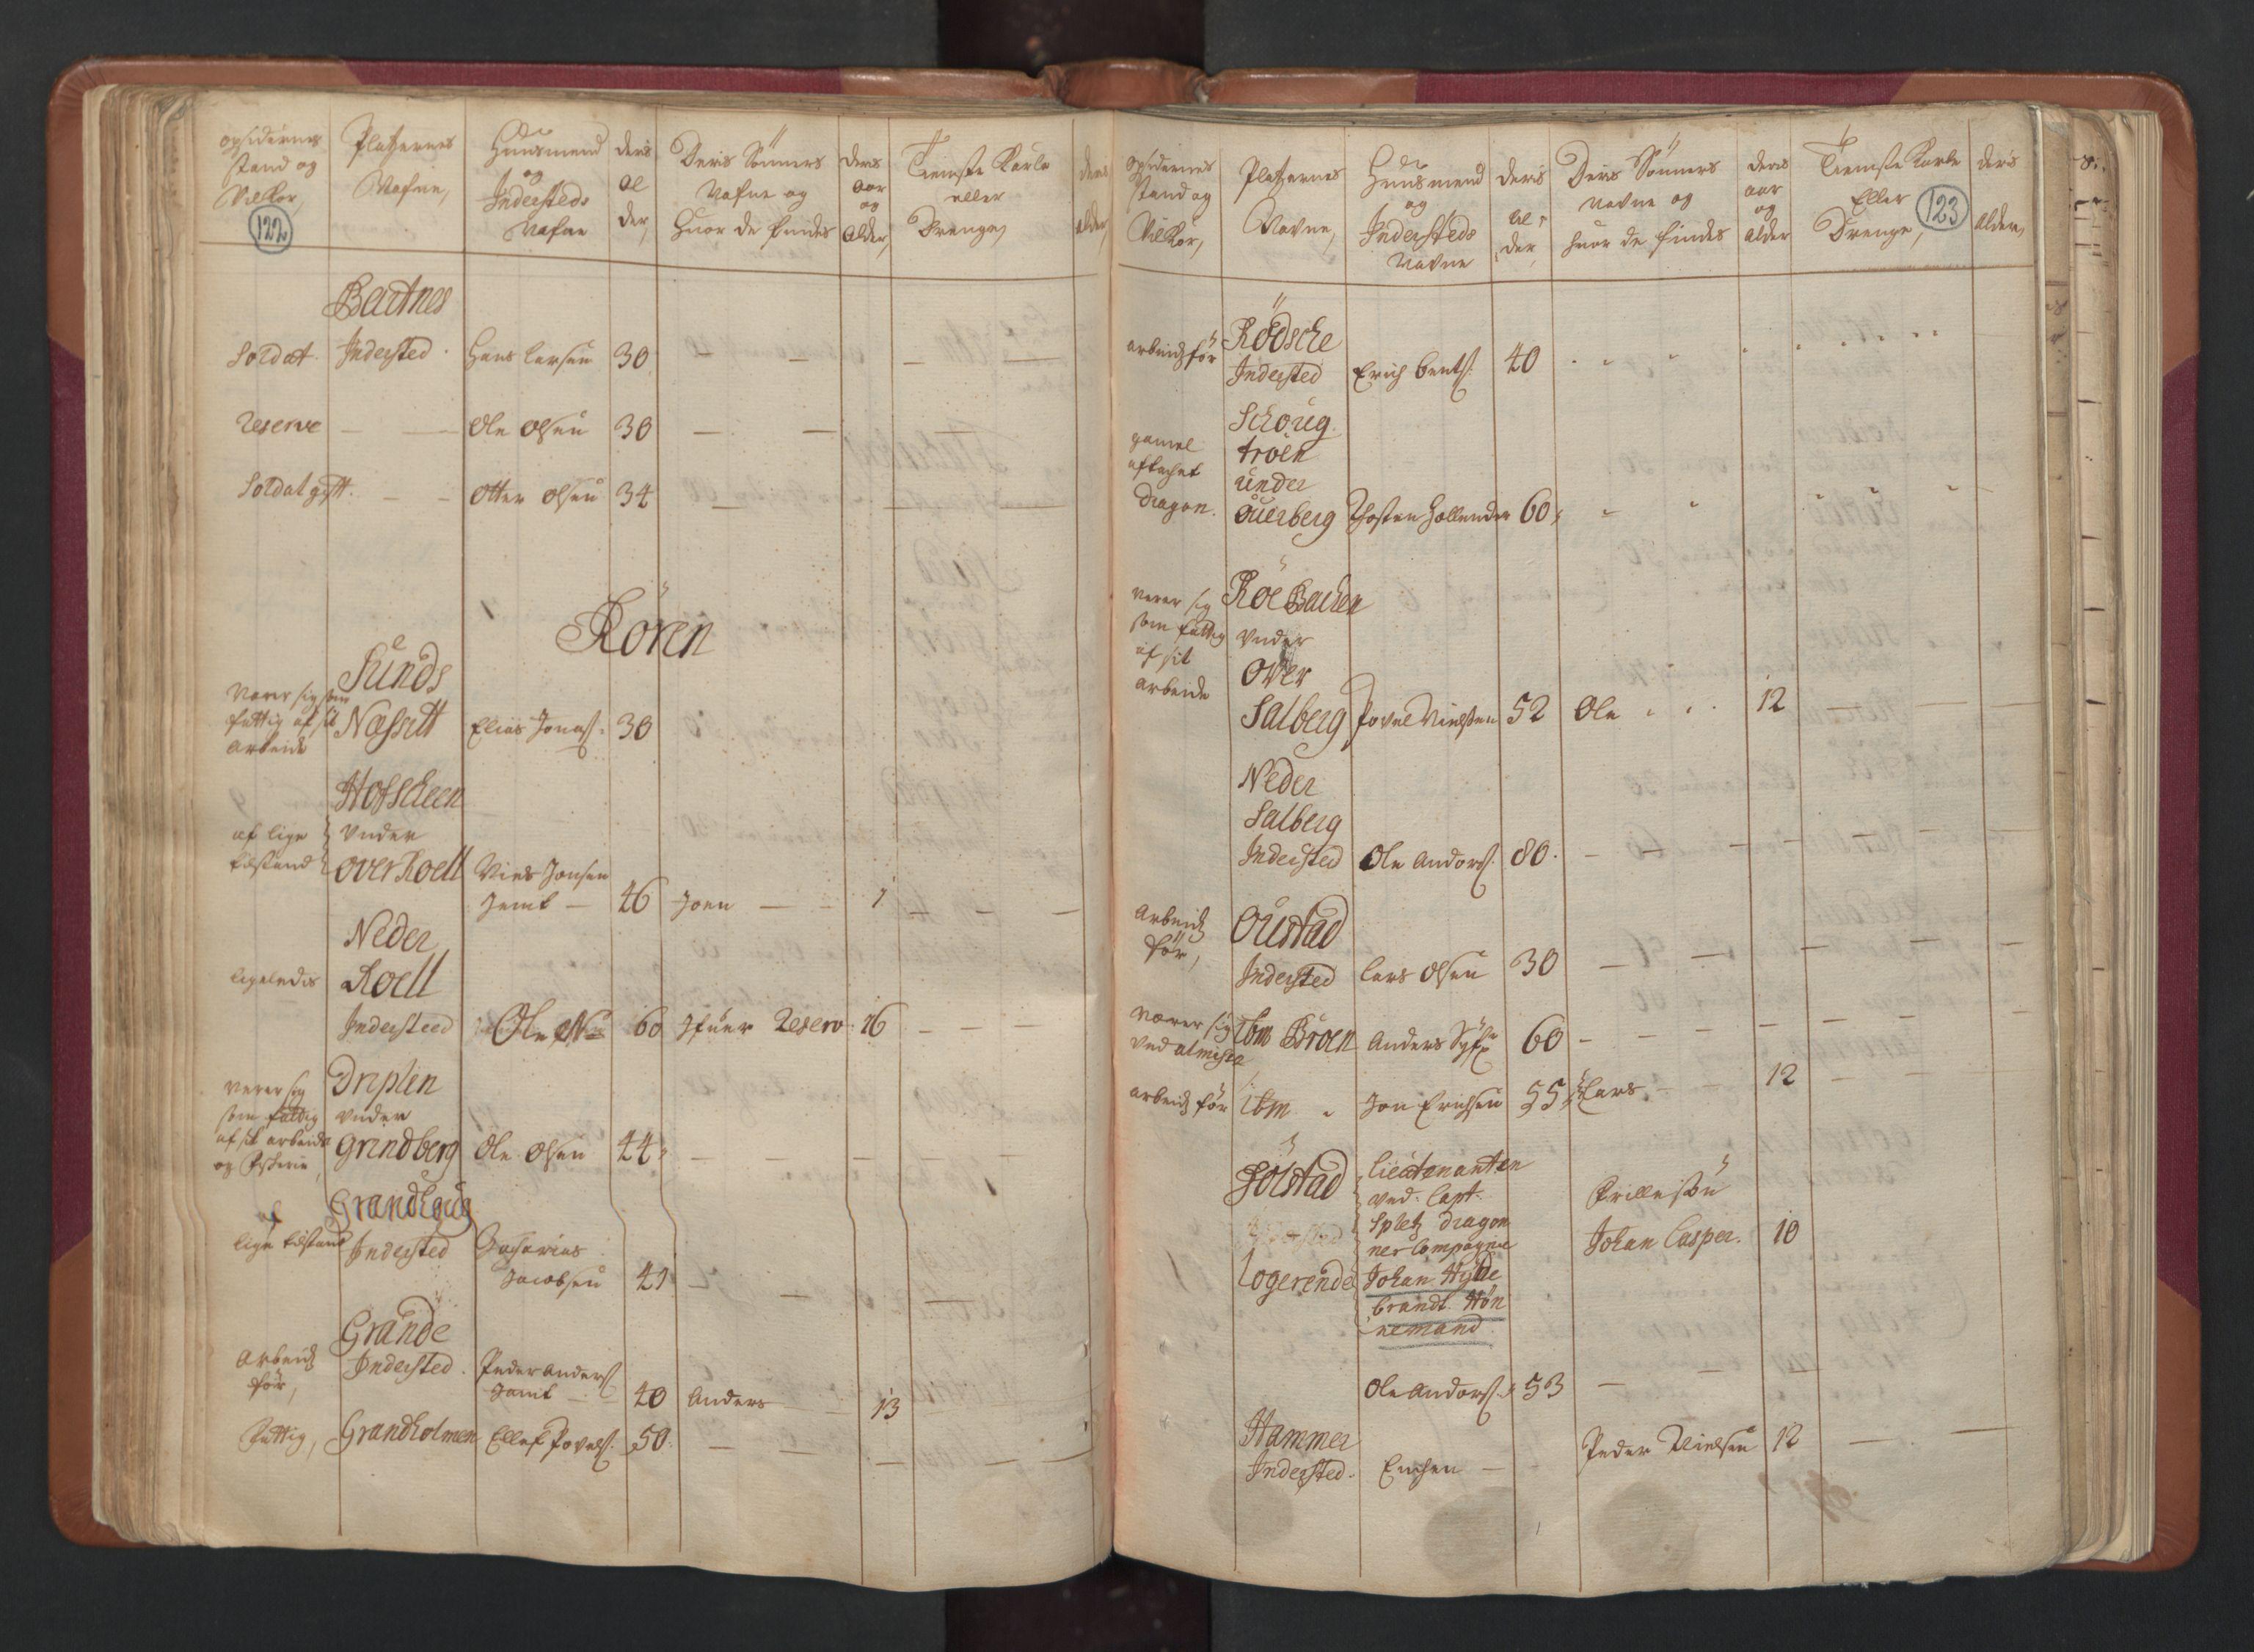 RA, Manntallet 1701, nr. 15: Inderøy fogderi og Namdal fogderi, 1701, s. 122-123